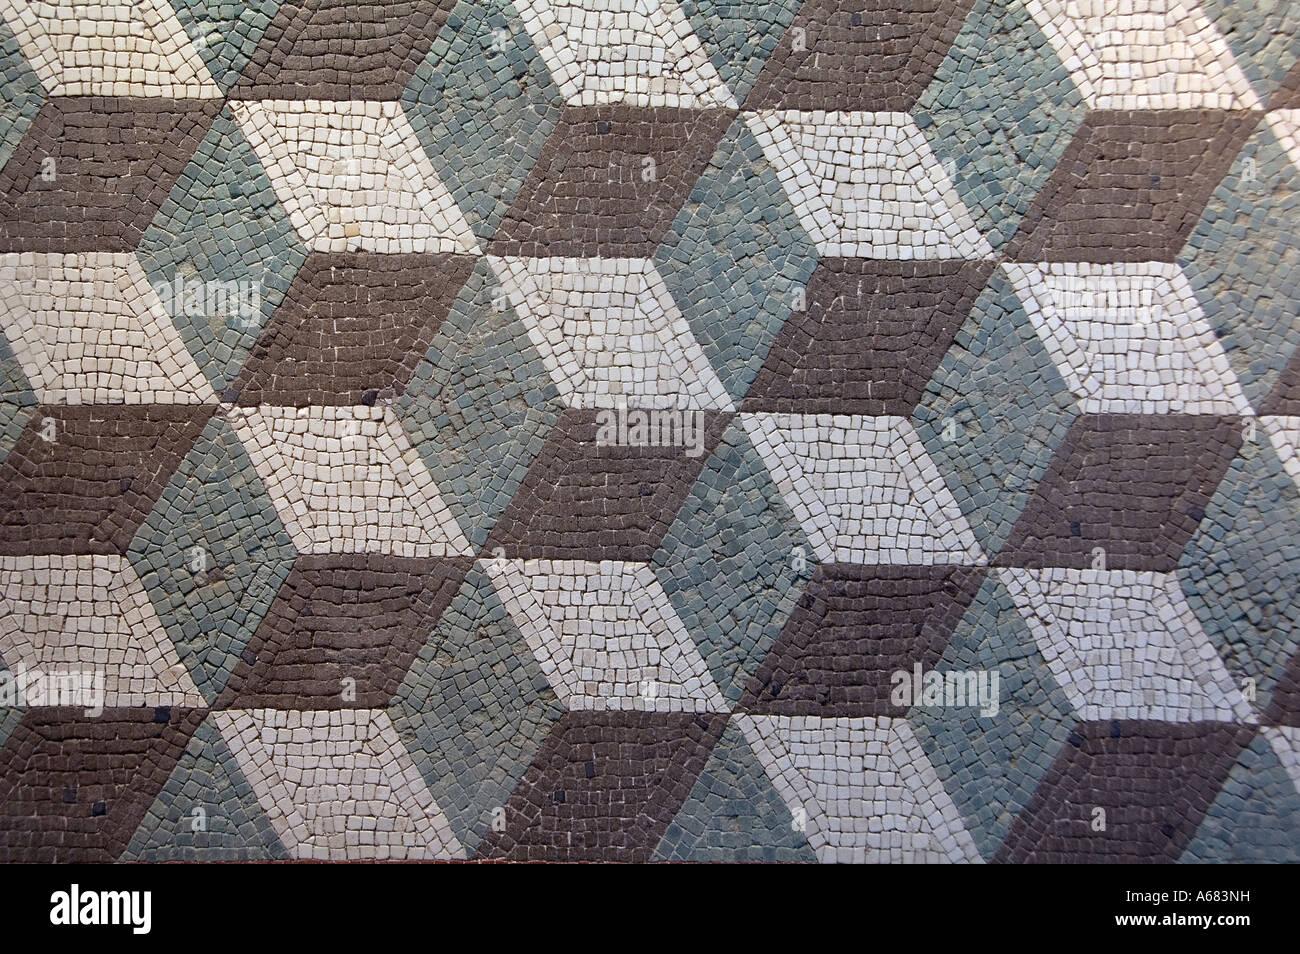 Ancient geometric roman mosaic displayed at Museu Nazionale Romano ( Palazzo Massimo Alle Terme ) Rome Italy - Stock Image